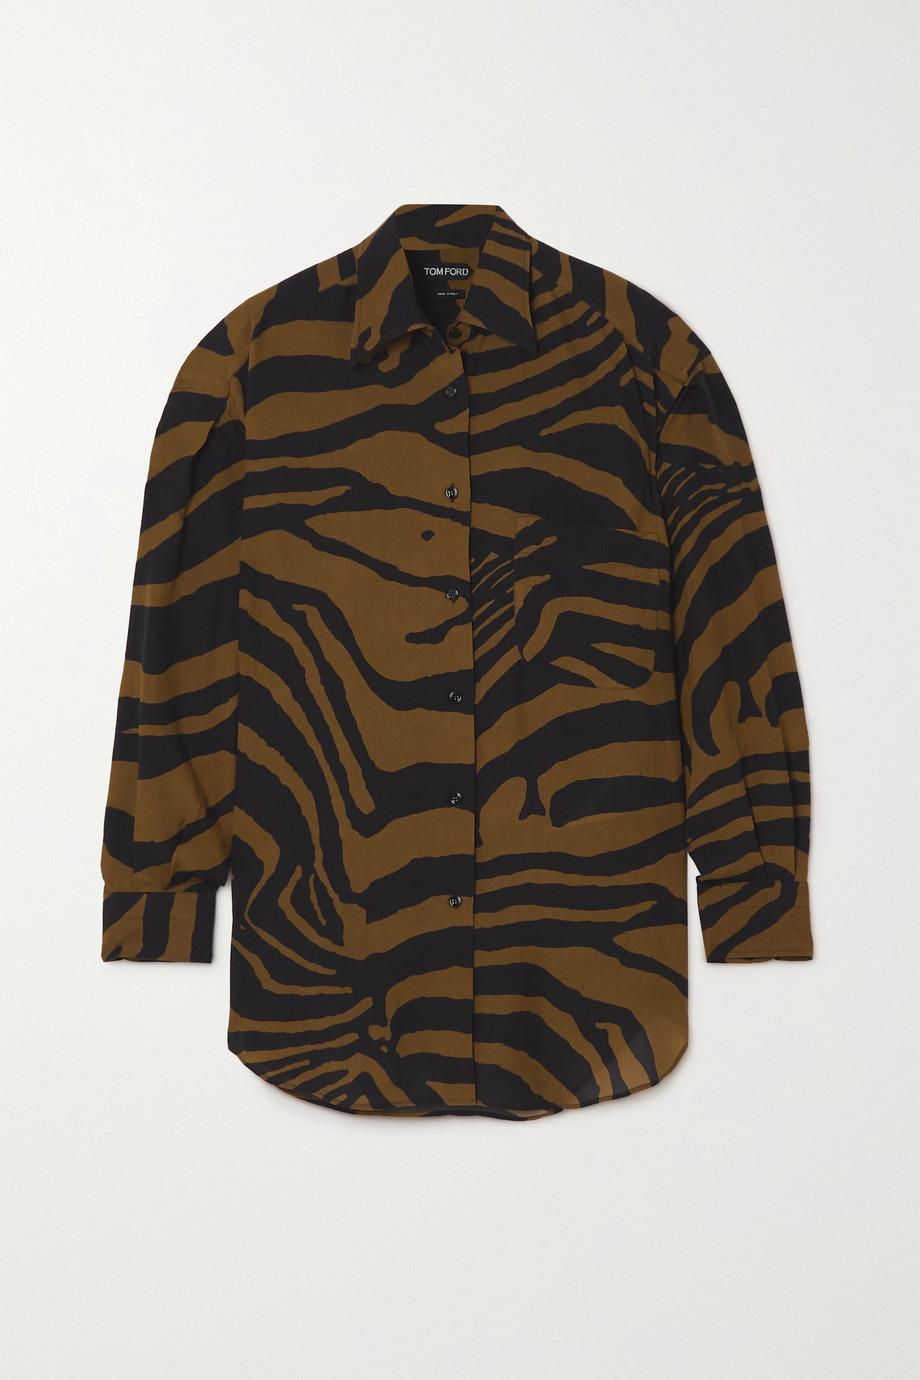 TOM FORD Oversized zebra-print Lyocell shirt